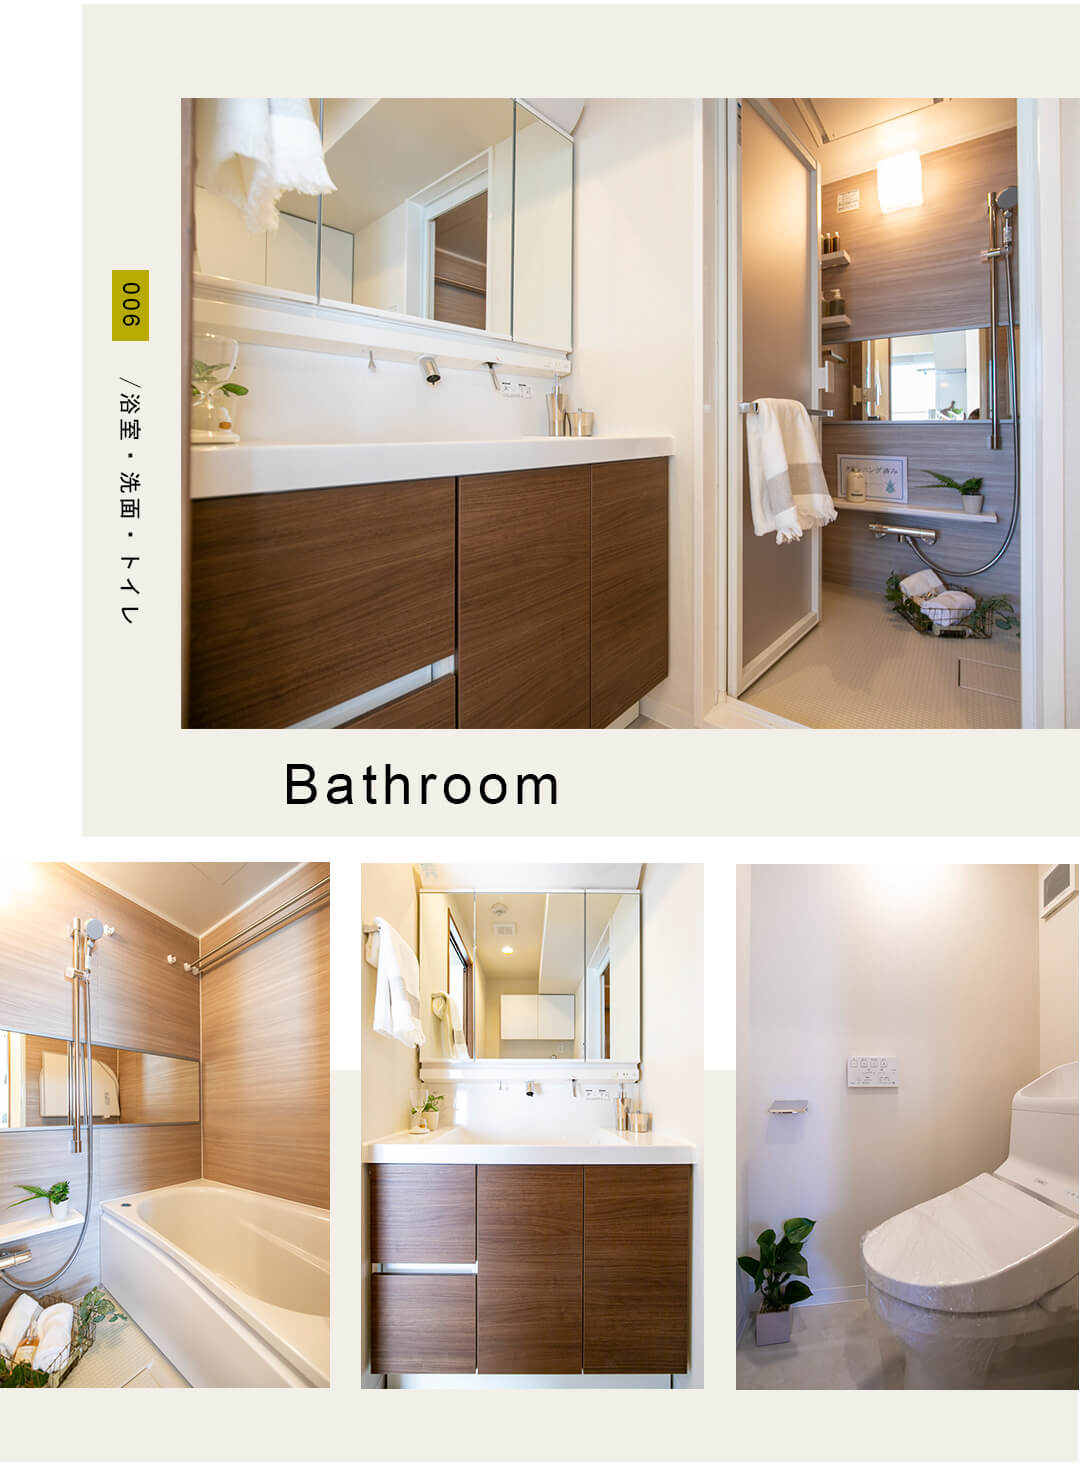 006,Bathroom,浴室,洗面,トイレ